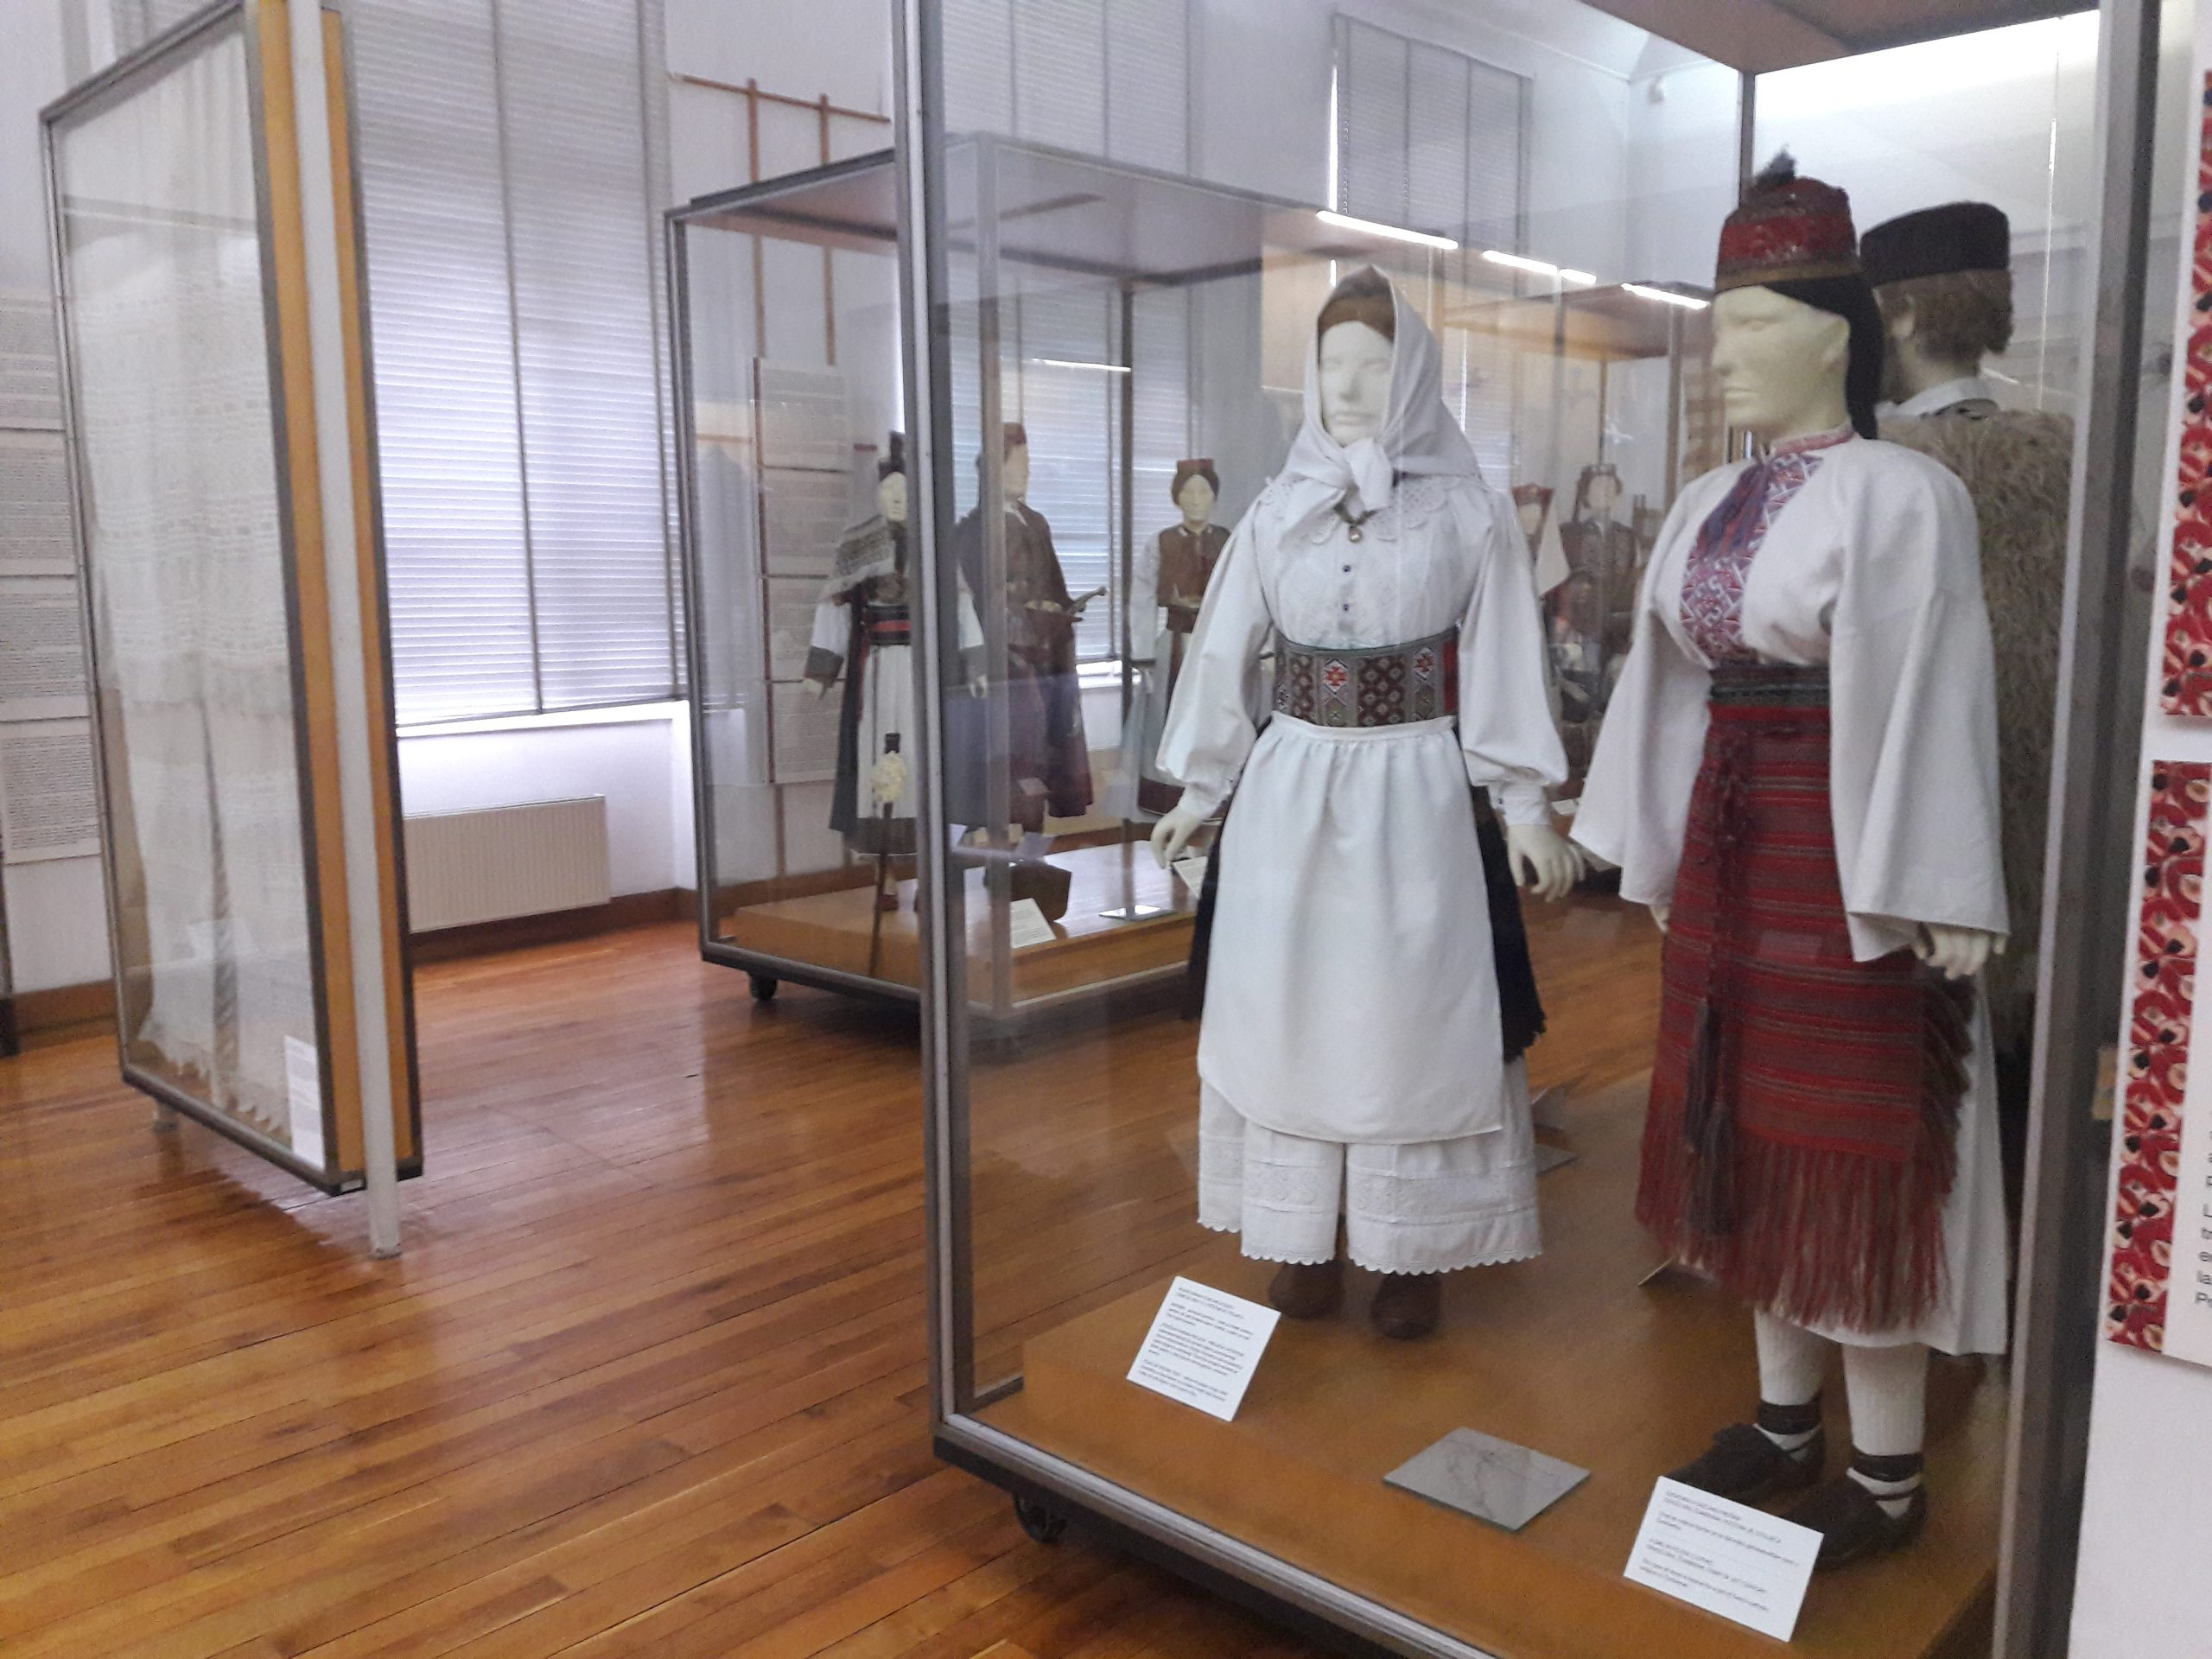 Posjet Etnografskom muzeju